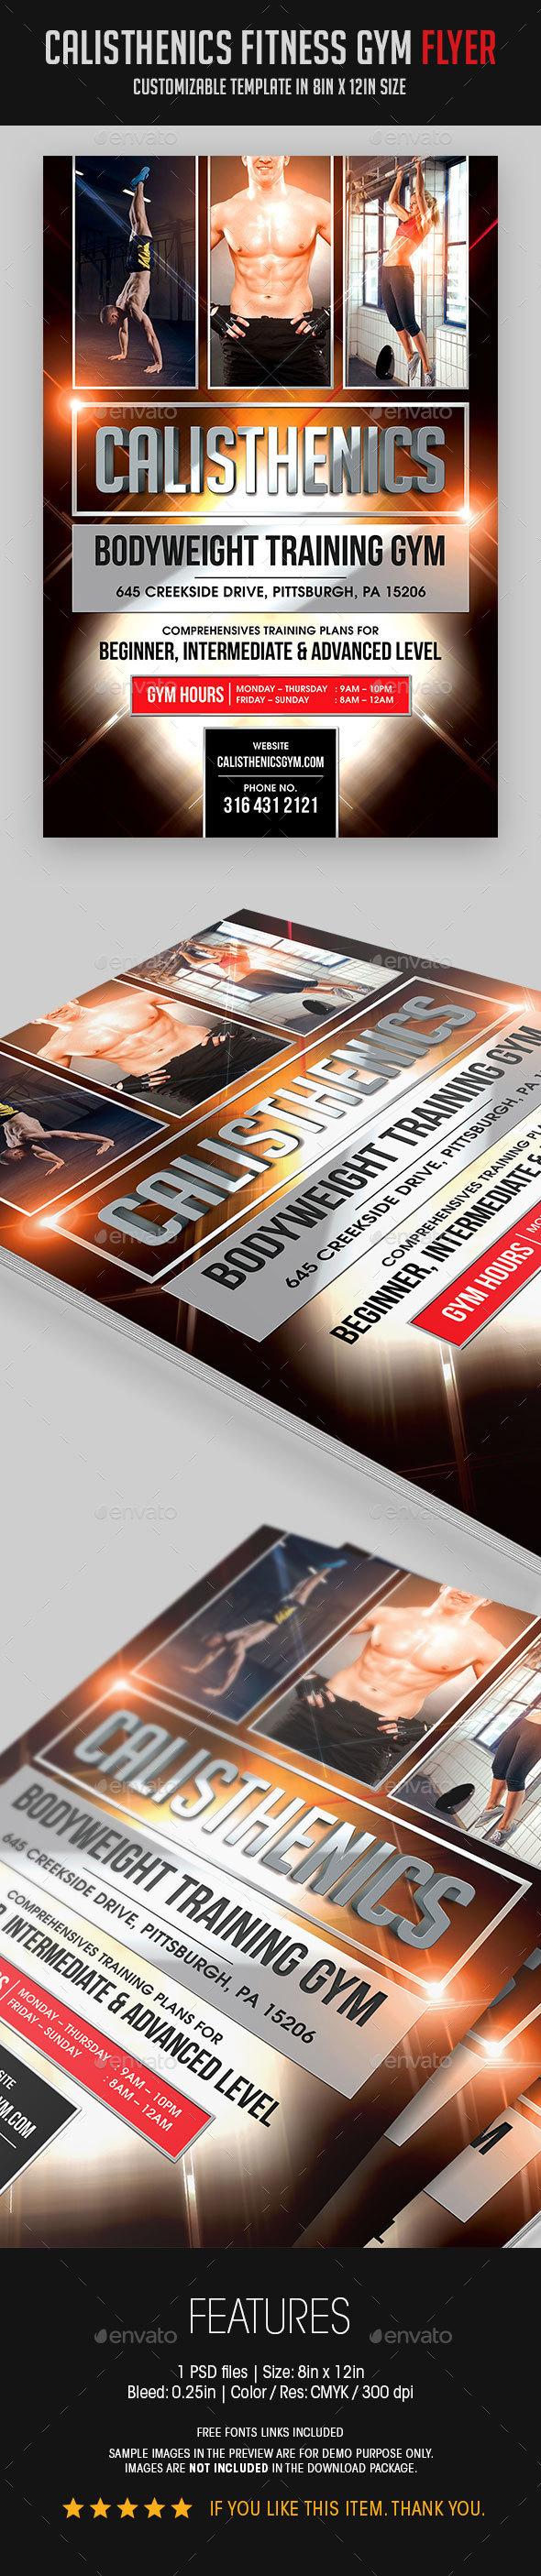 Calisthenics Fitness Gym Flyer - Sports Events